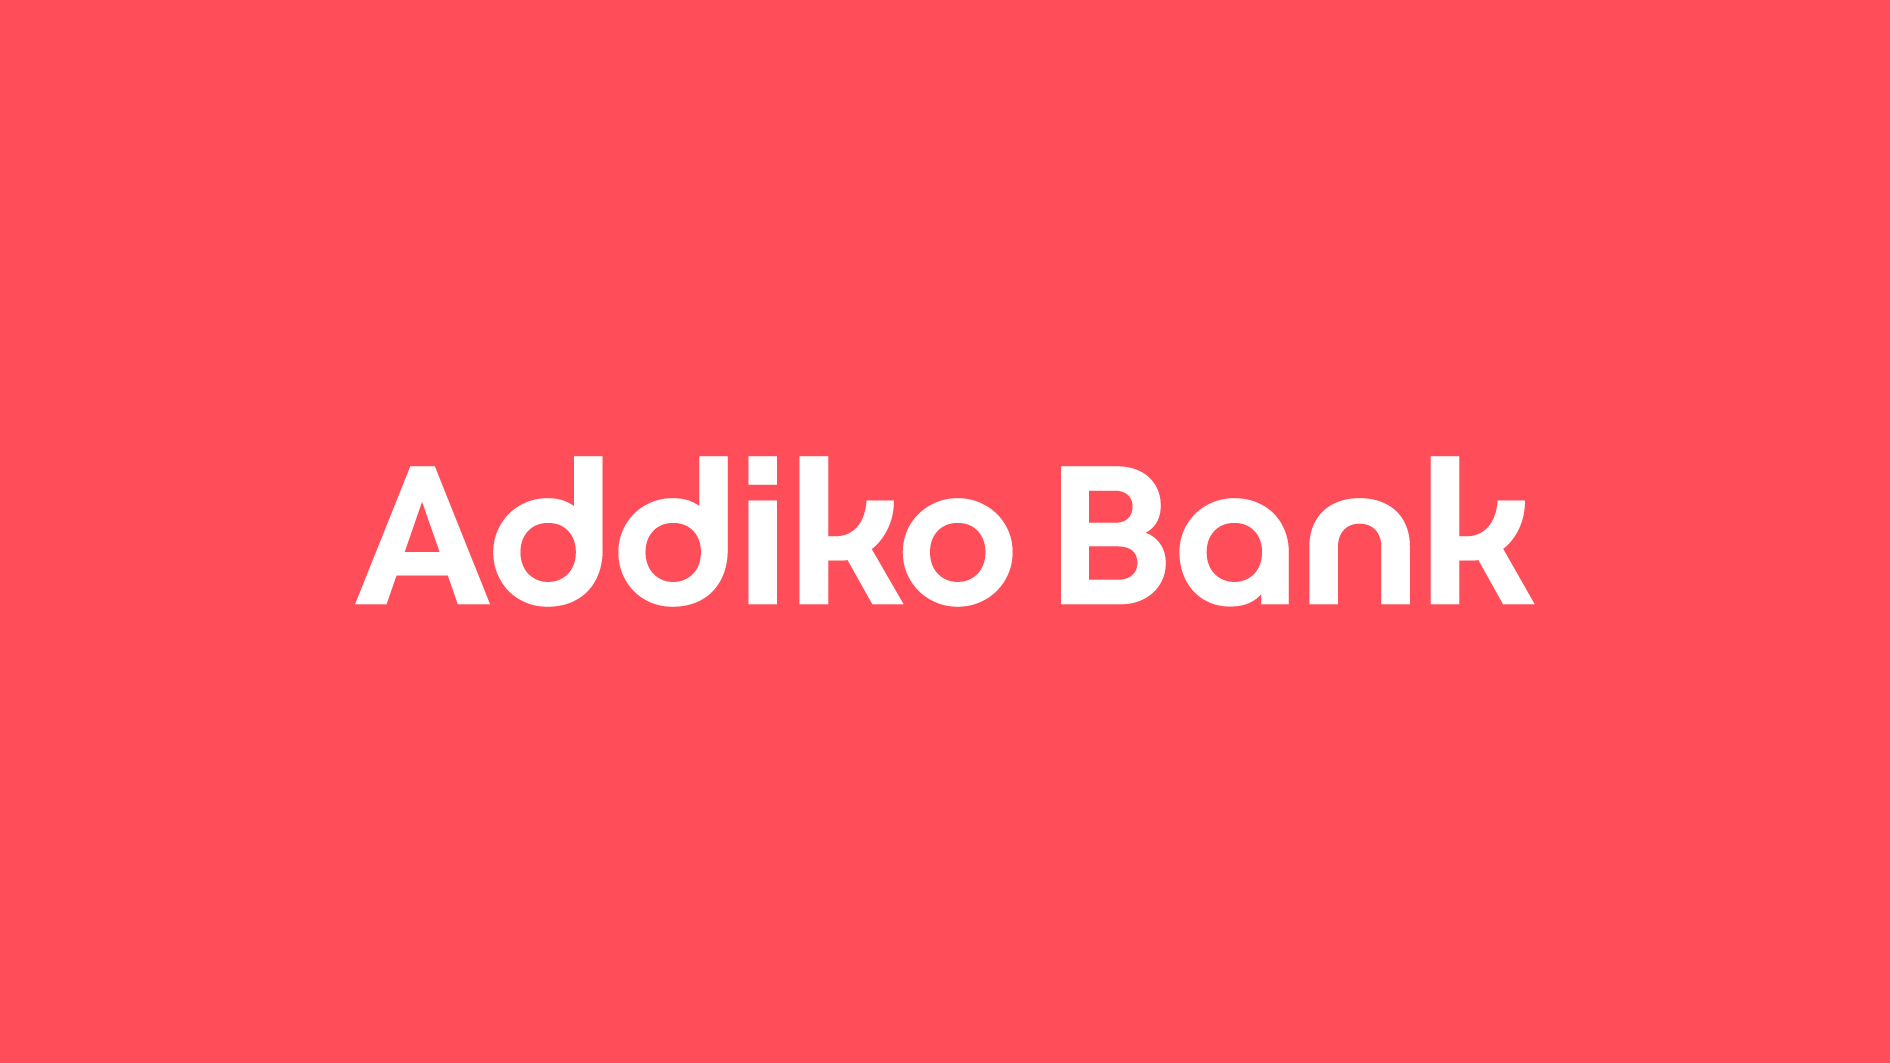 Addiko_16by9_Case_Study_FINAL_150DPI_2.jpg